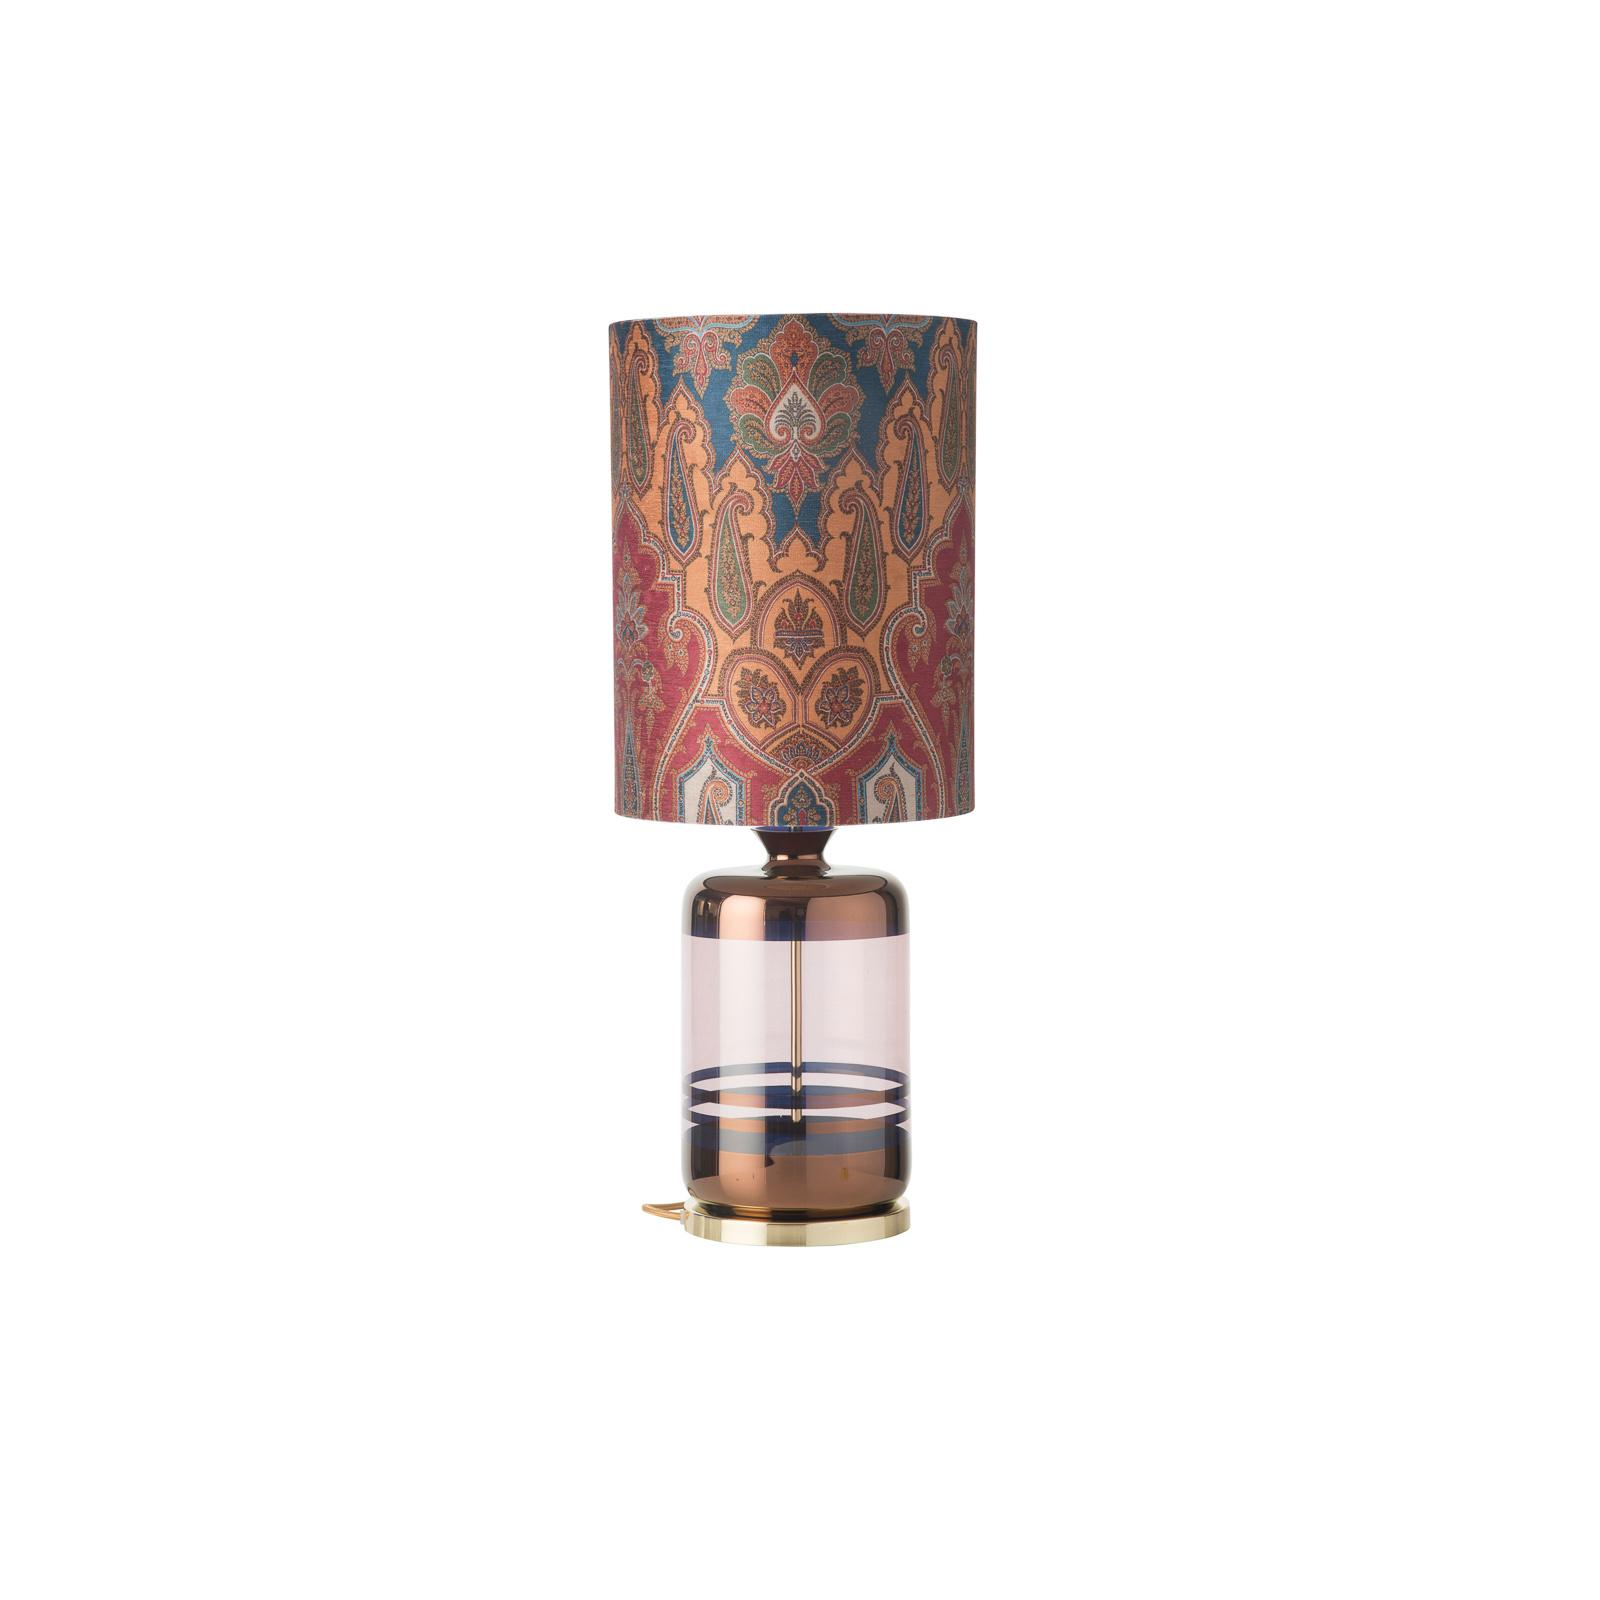 EBB & FLOW Pillar lampa stołowa, Brocade blue/red